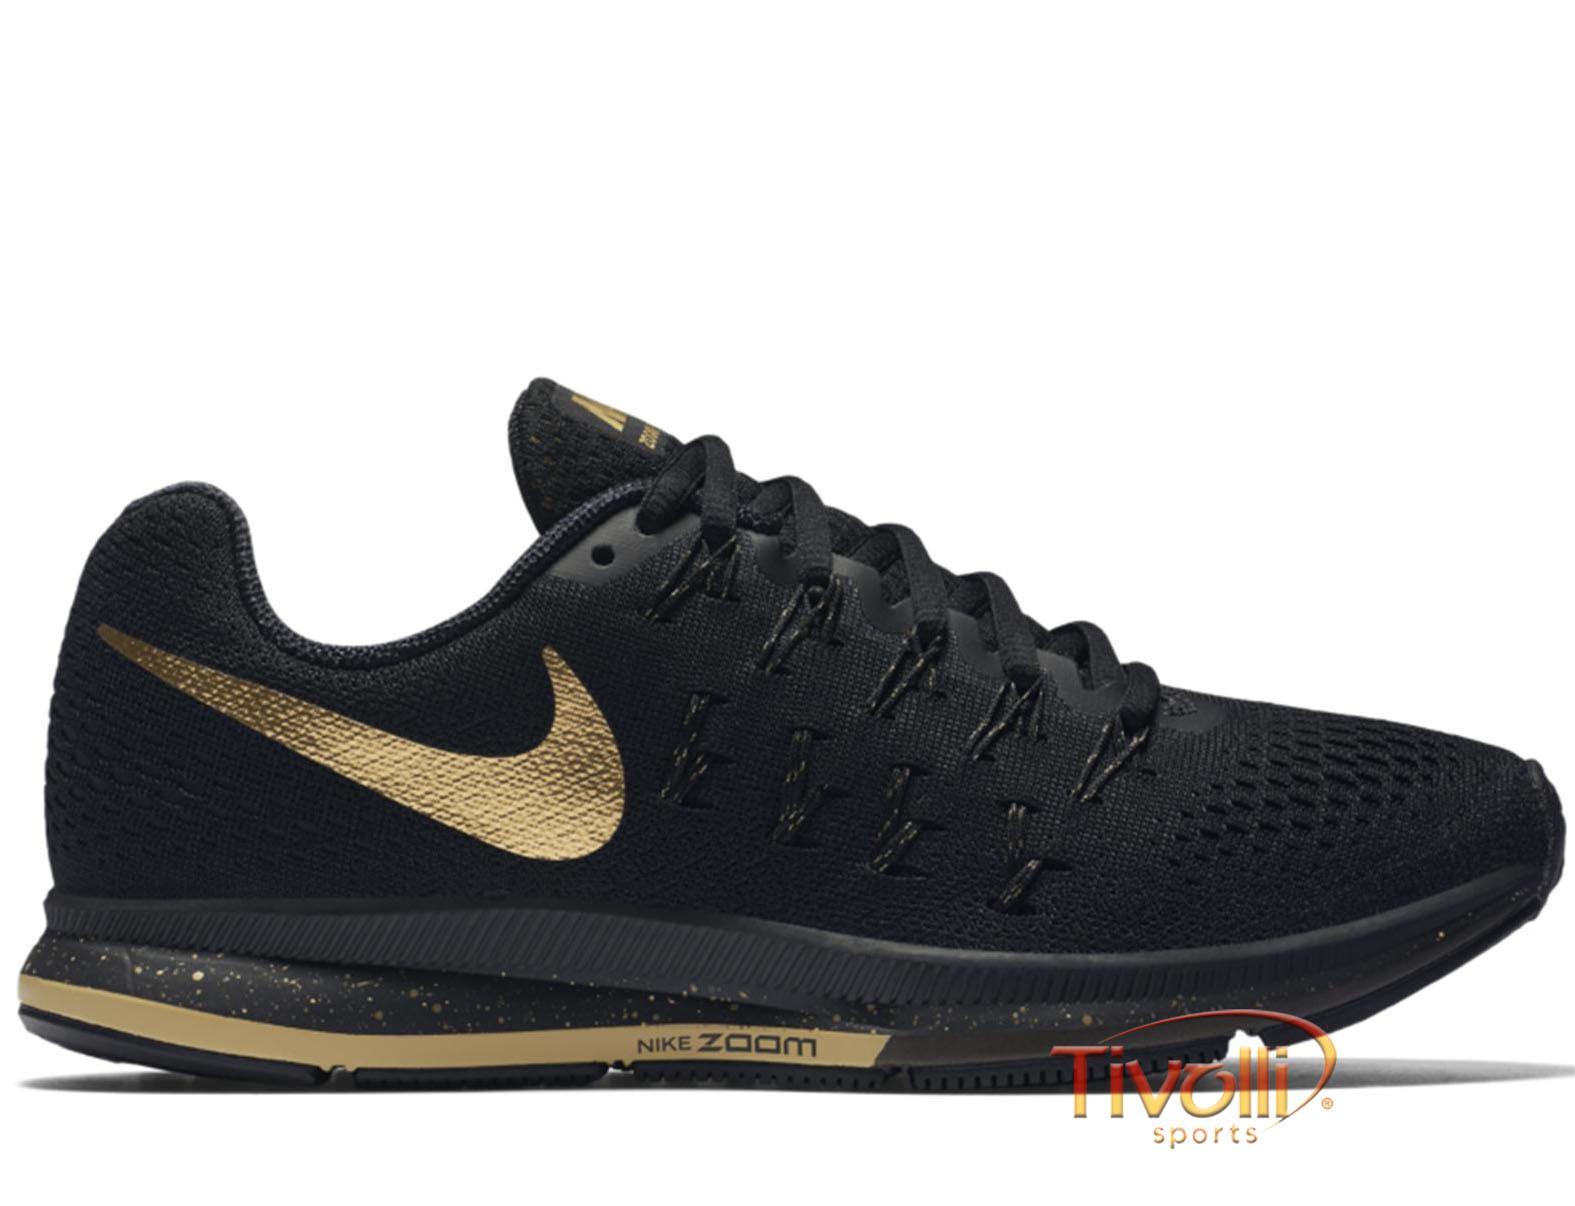 0dfa05c30c0 Tênis Nike Air Zoom Pegasus 33 LE BG   Preto e Dourado